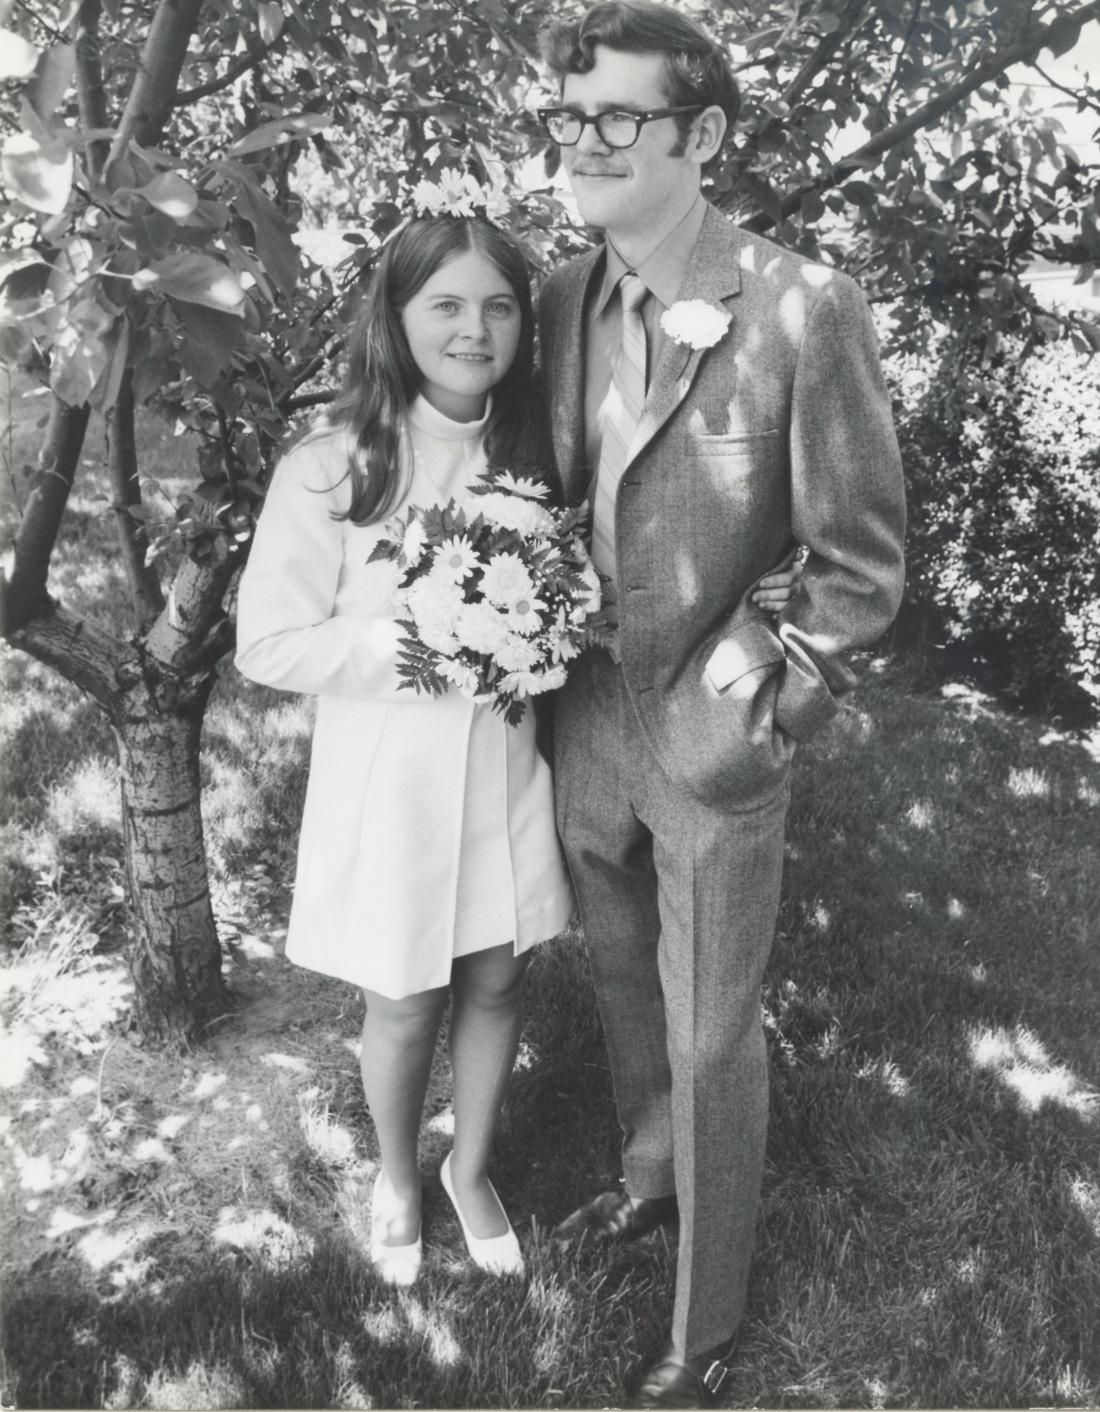 Jim and Nancy 5_30_70 1